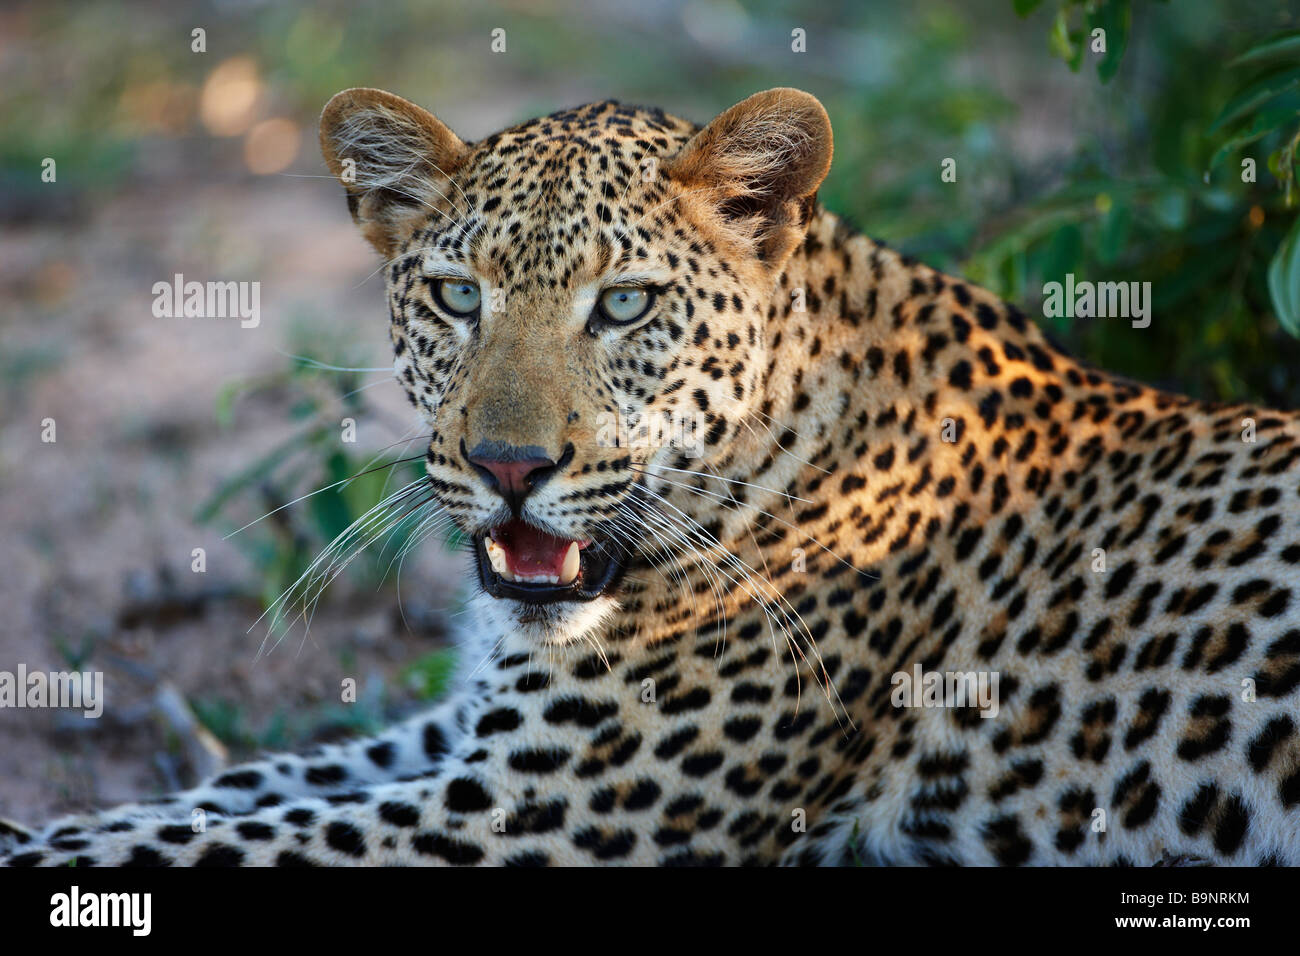 leopard resting in the bush, Kruger National Park, South Africa - Stock Image